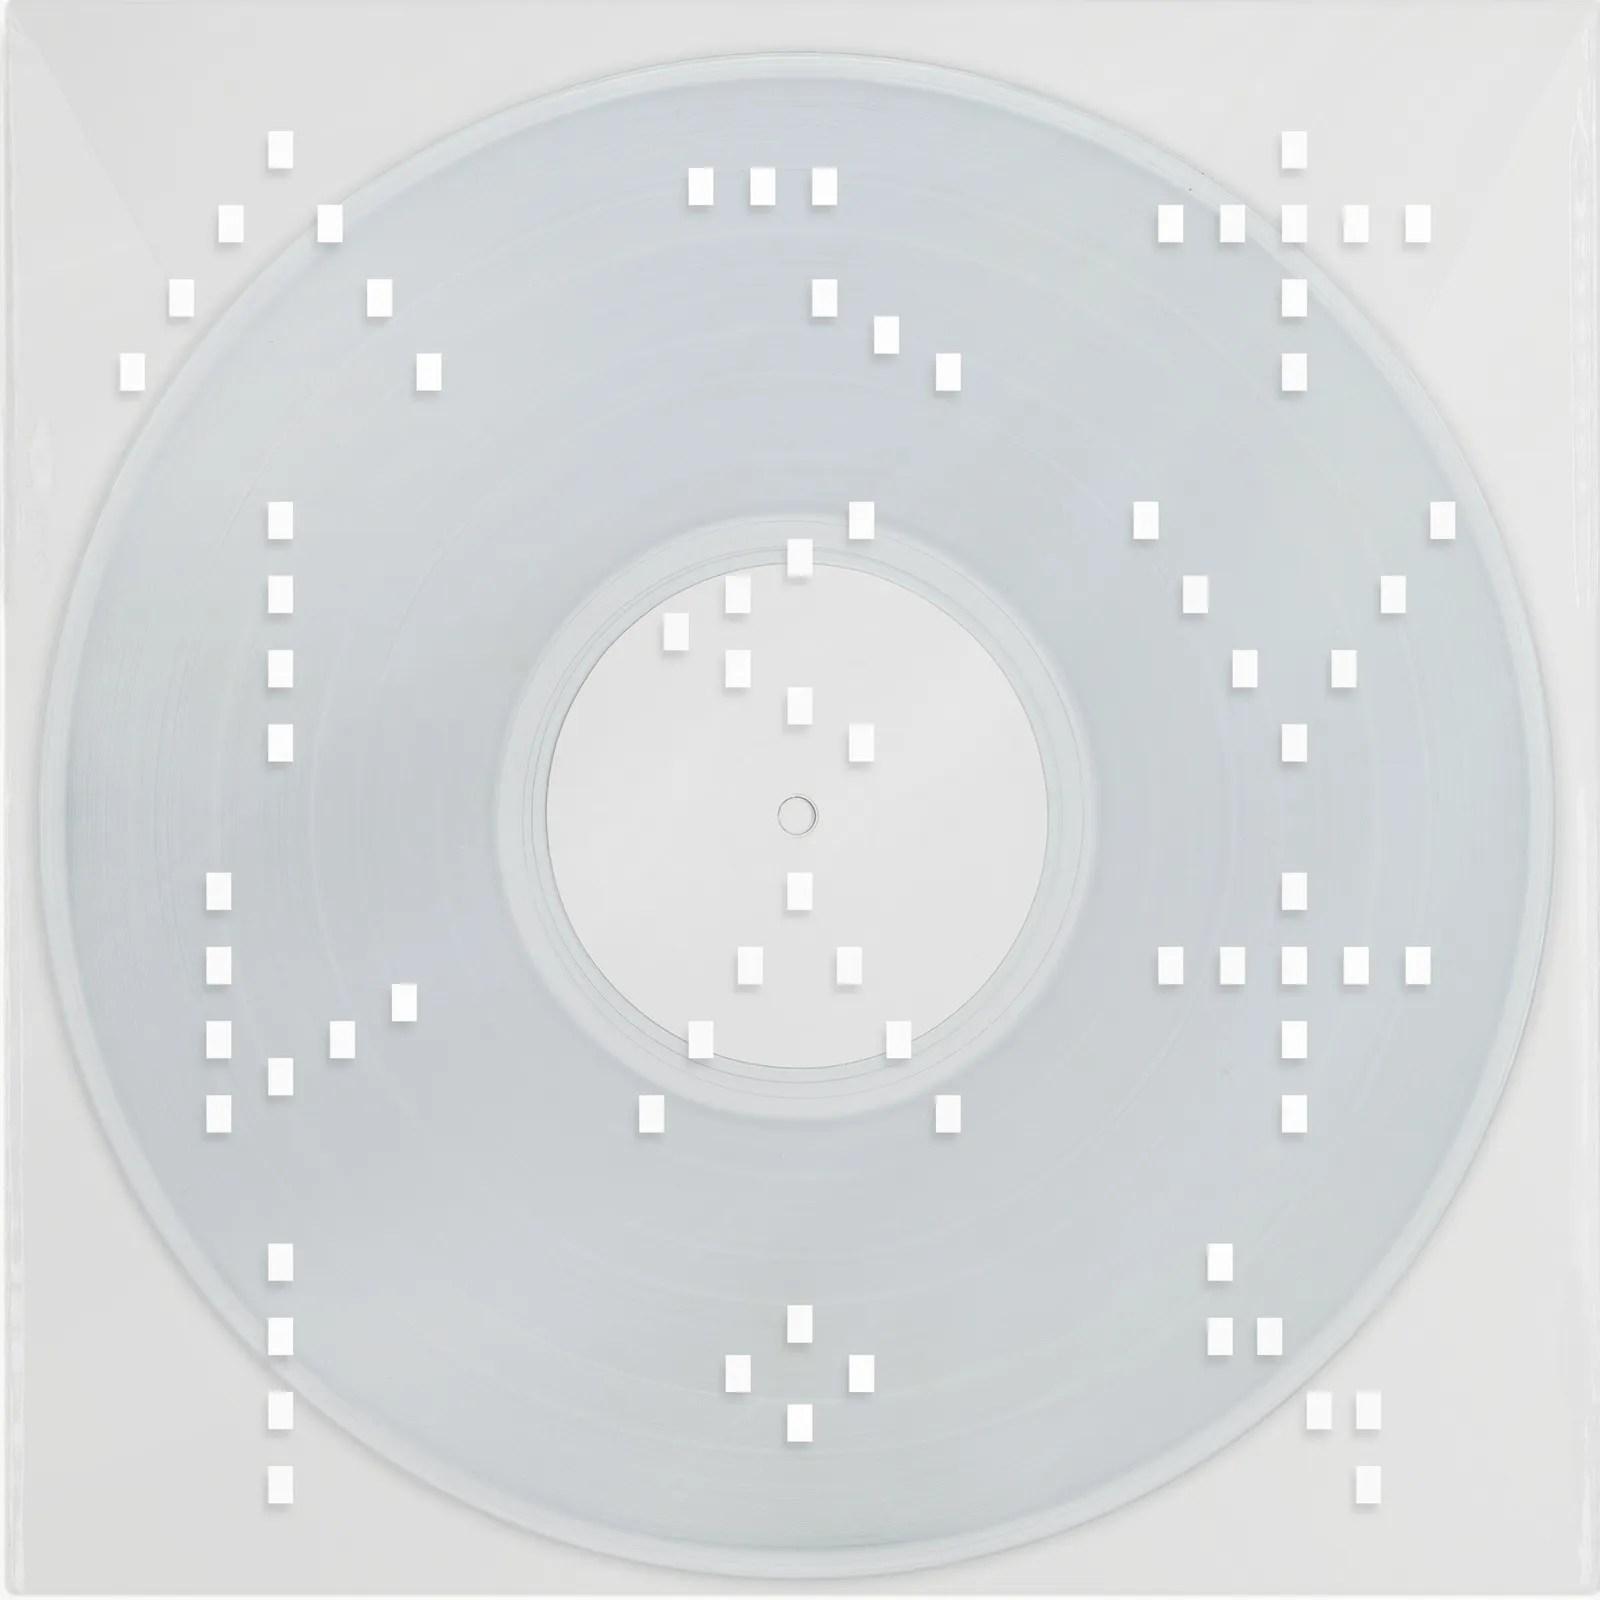 Rival Consoles Announces New Album Articulation Shares New Song Listen